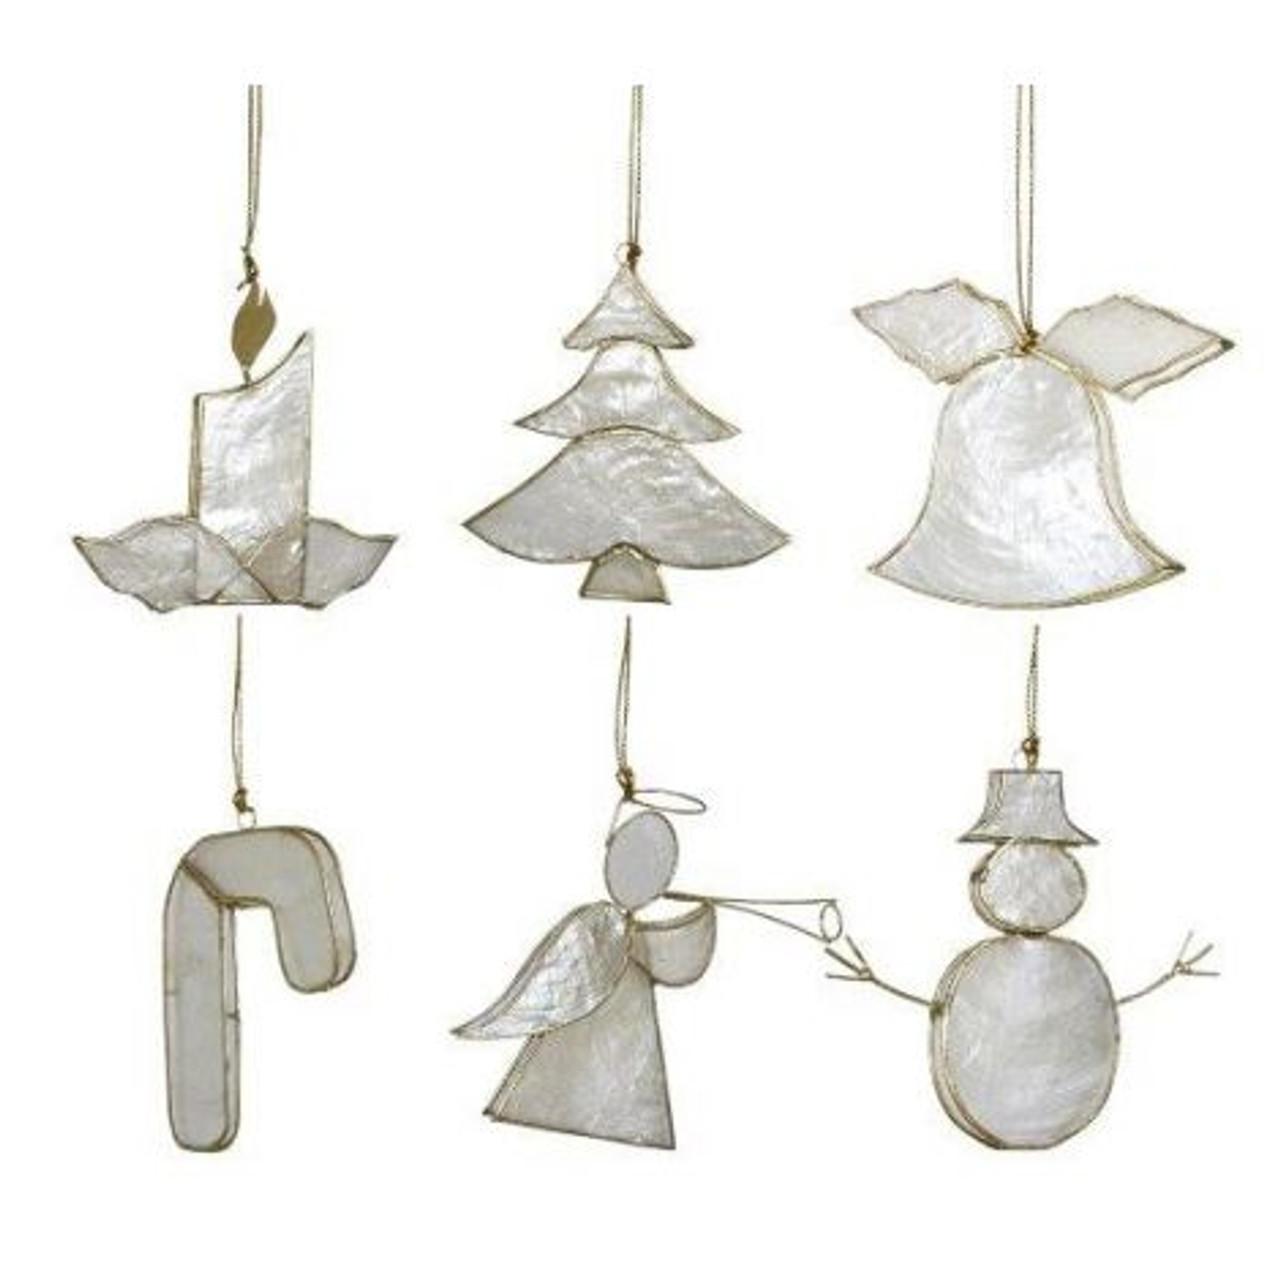 Capiz Christmas Ornaments - Set of 6 - Complete